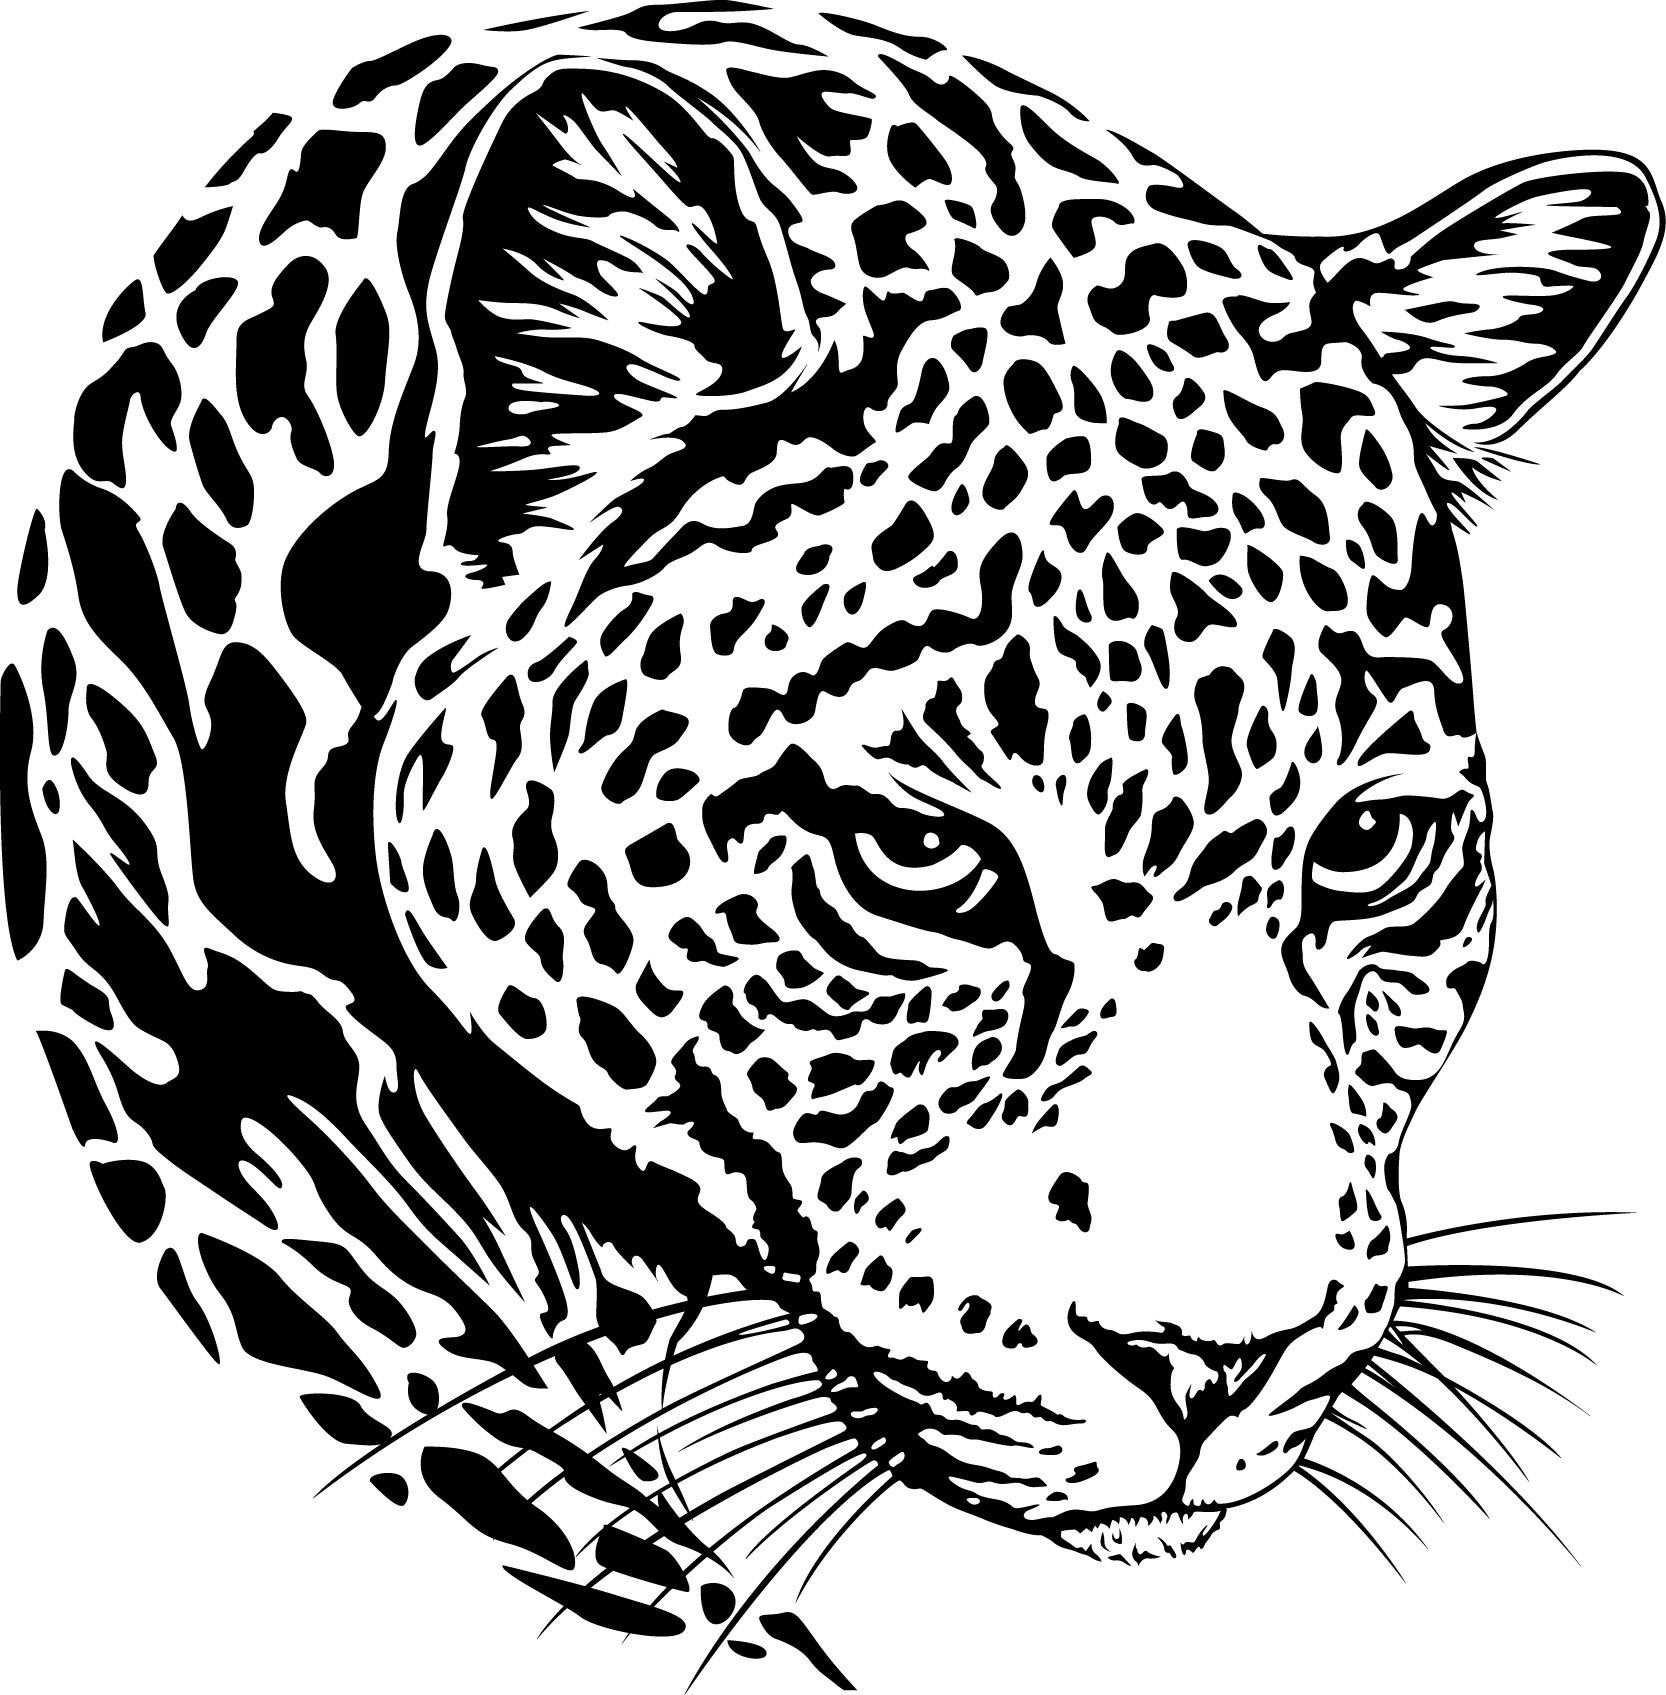 Jaguar Hoofd Logo Svg Silhouet Vinyl Snijden Bestand Dfx Etsy